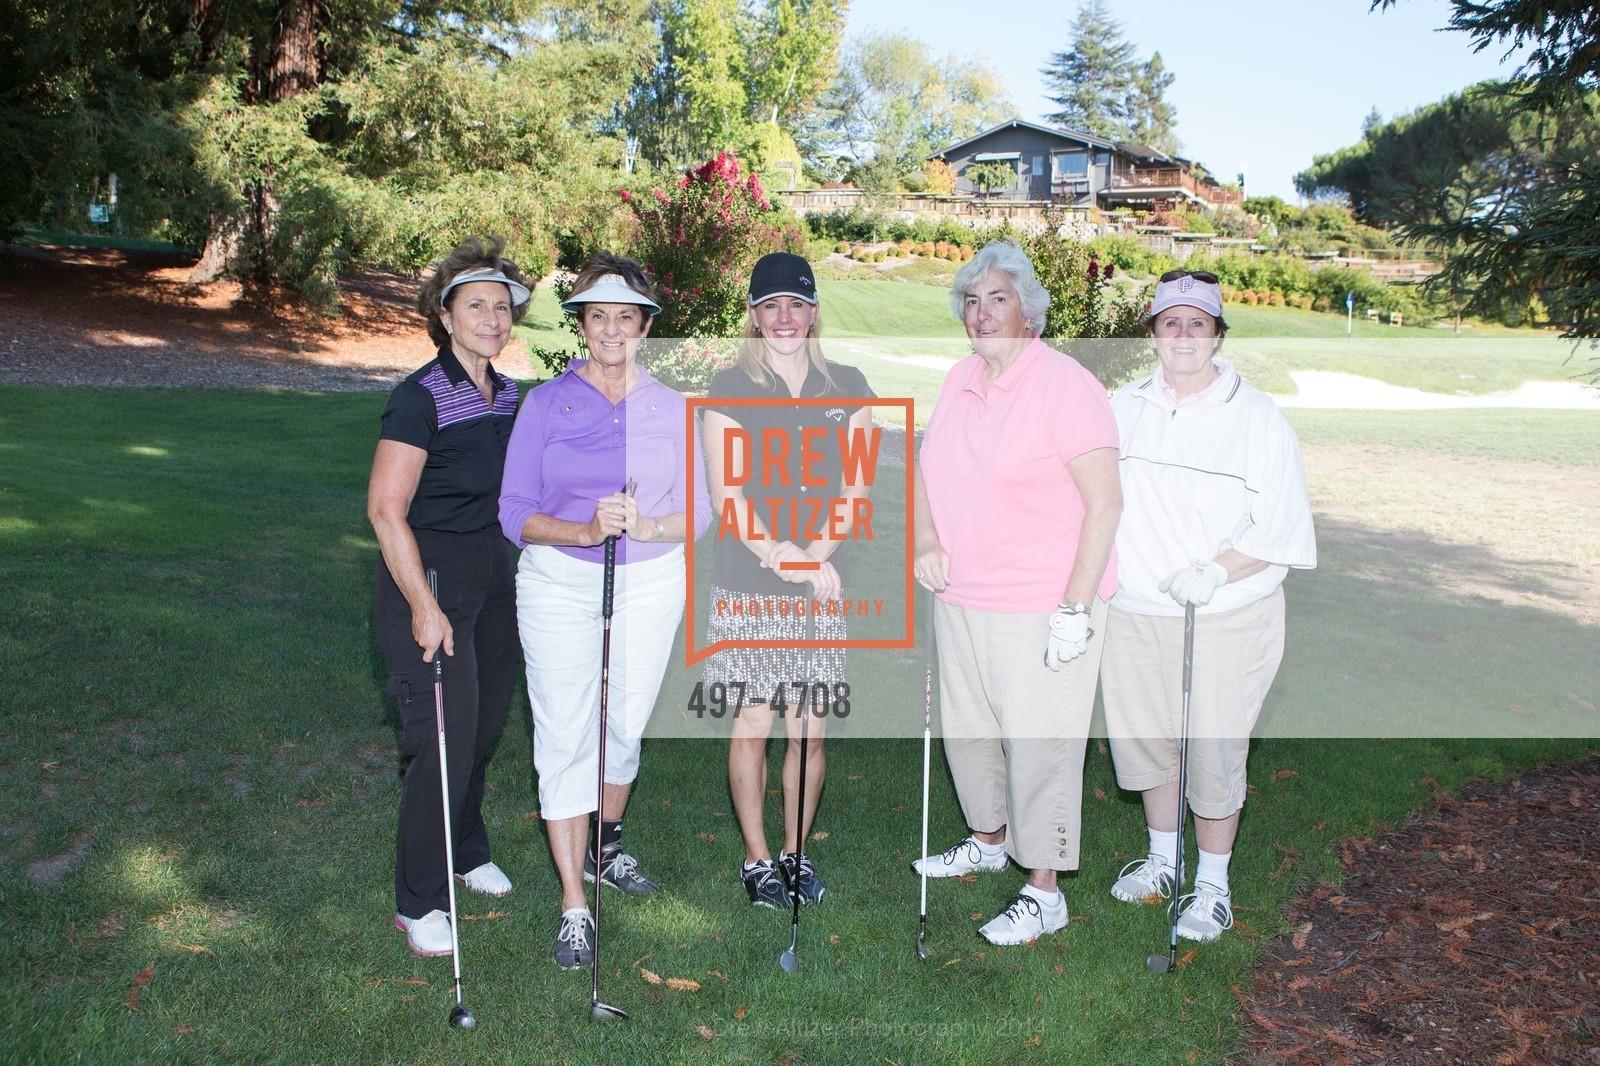 Sandy Klang, Gail Hynding, Tina Michelson, Virginia Andersen, Chris Goethals, Photo #497-4708